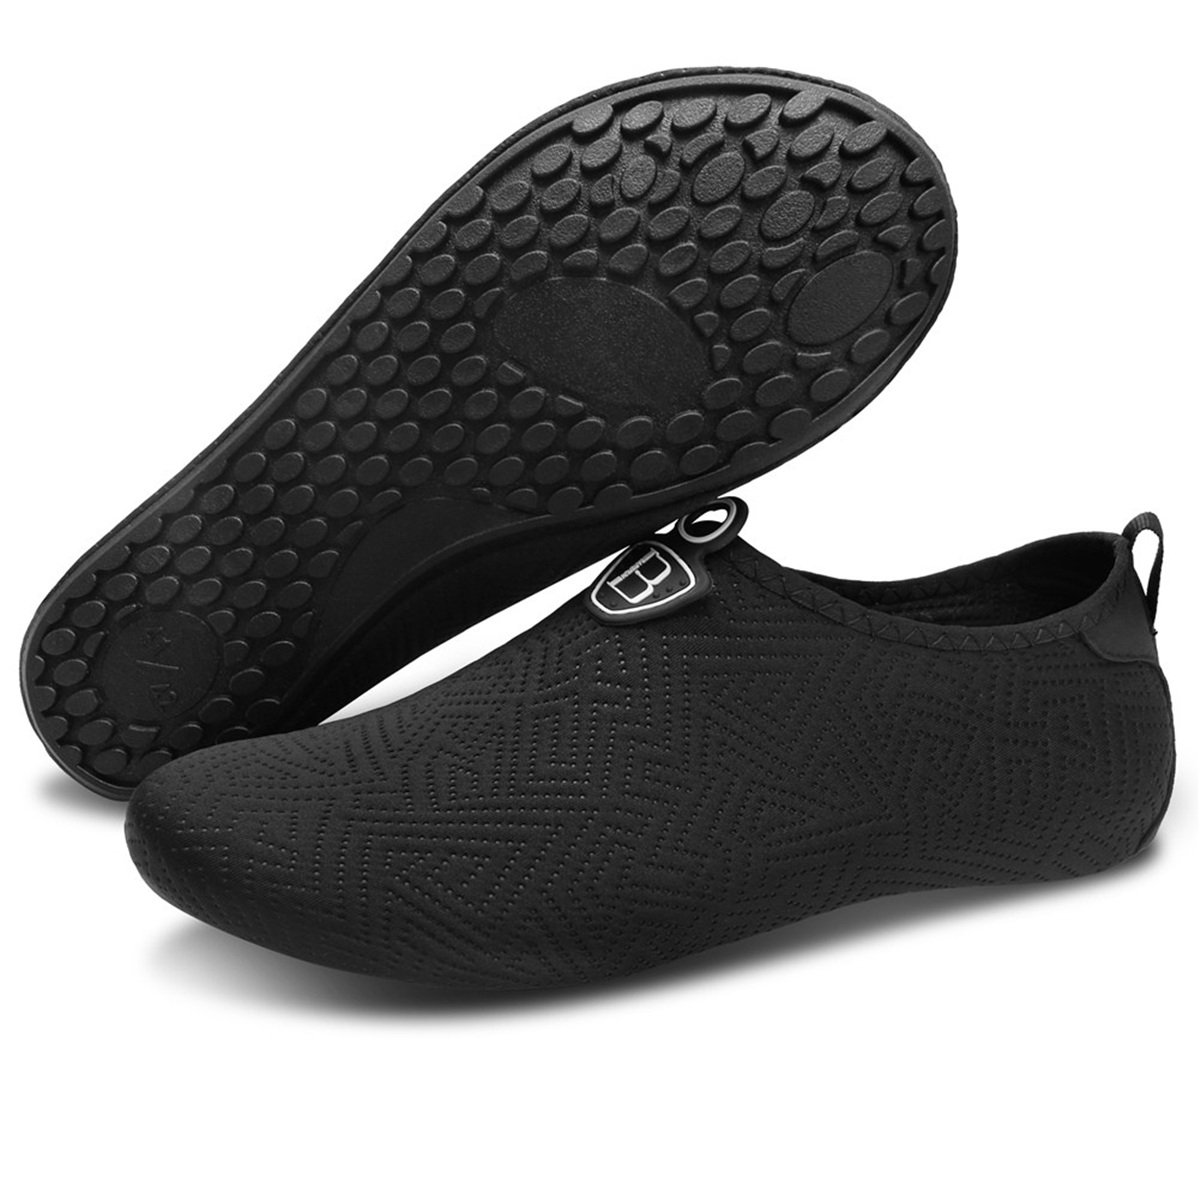 Barerun Barefoot Quick-Dry Water Sports Shoes Aqua Socks for Swim Beach Pool Surf Yoga for Women Men XXL(W:12-13,M:10-11) …